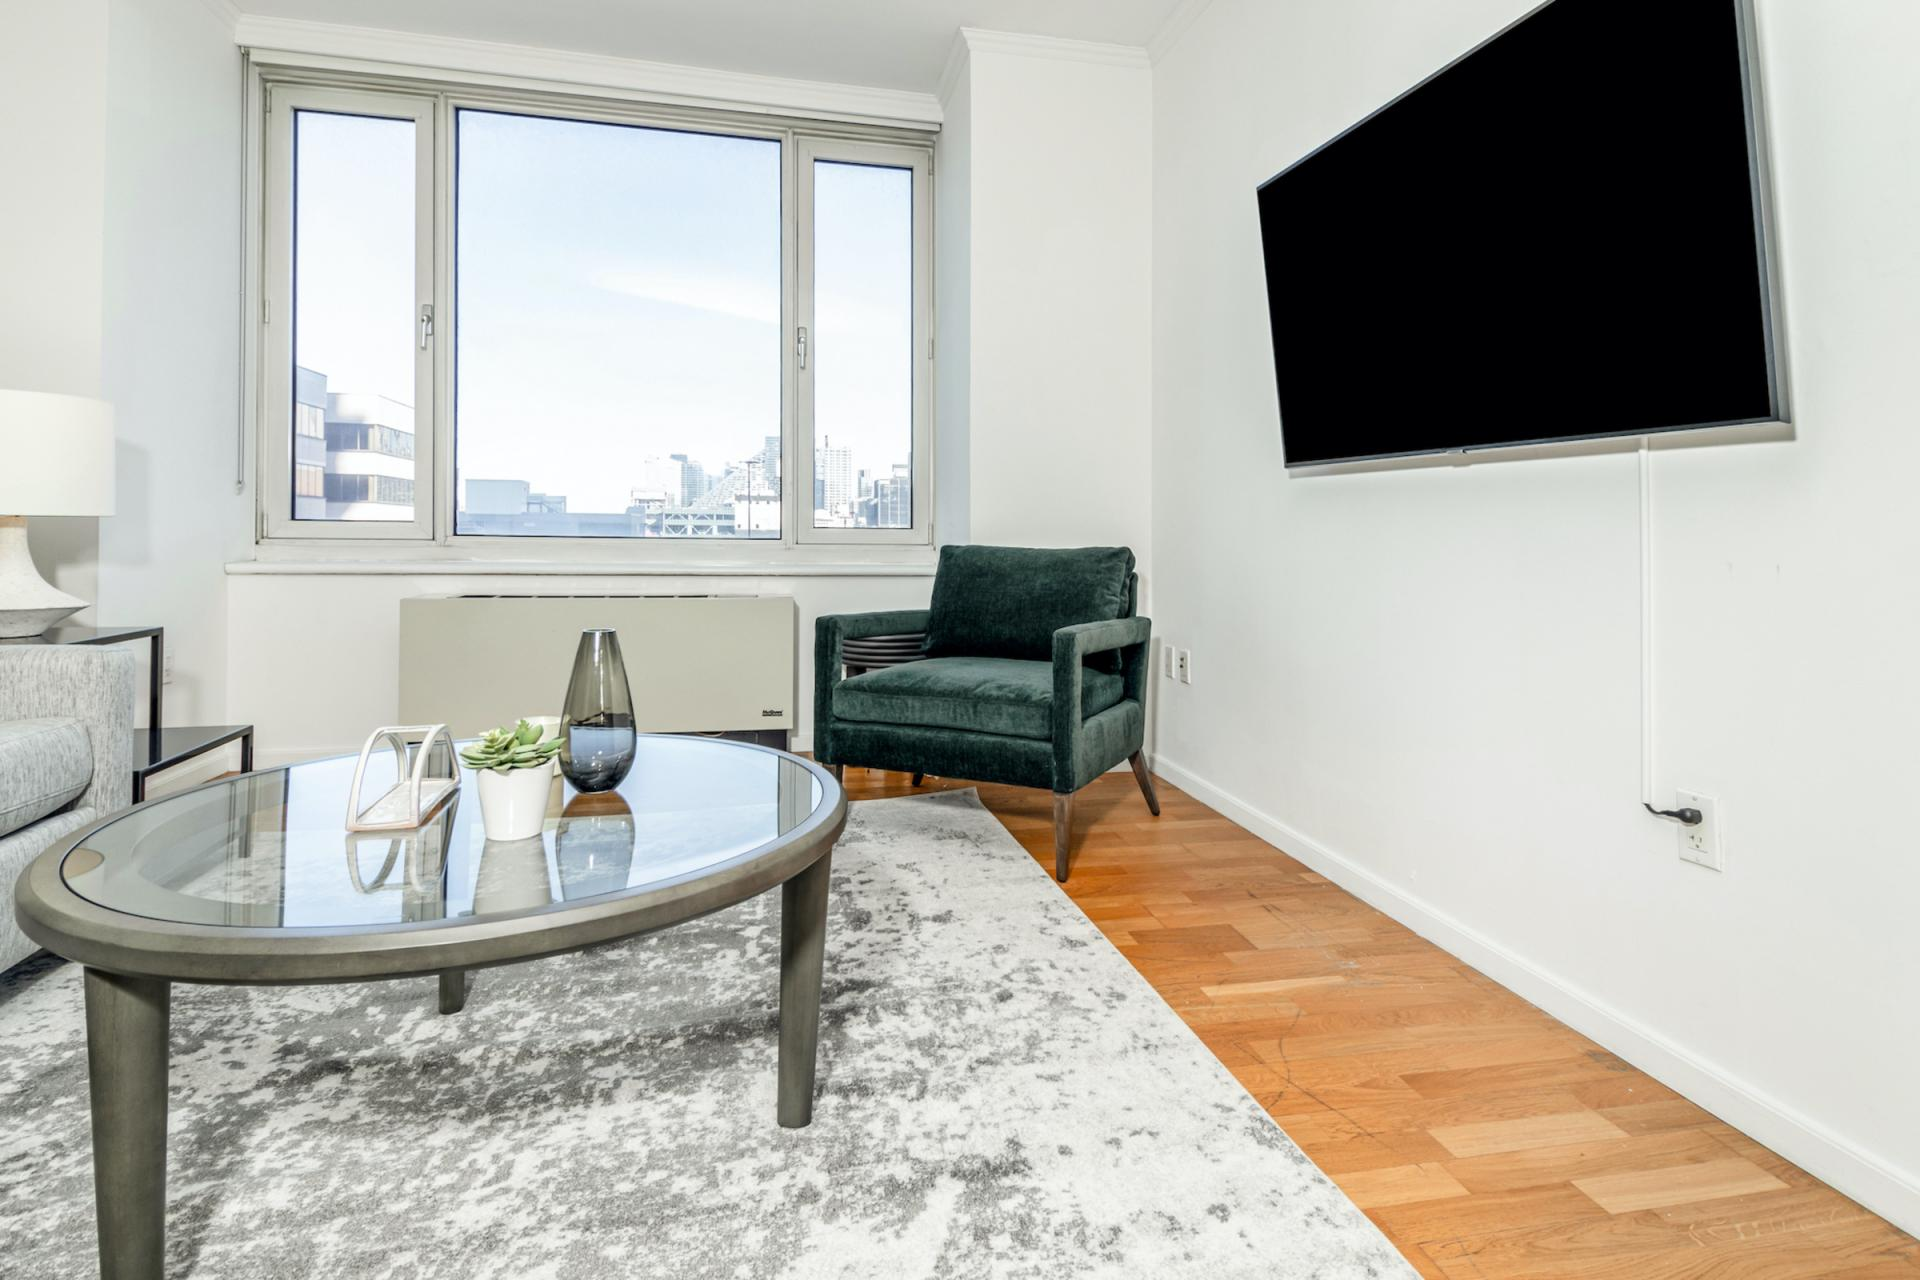 TV at Apartments at Alexan 100, Belltown, Seattle